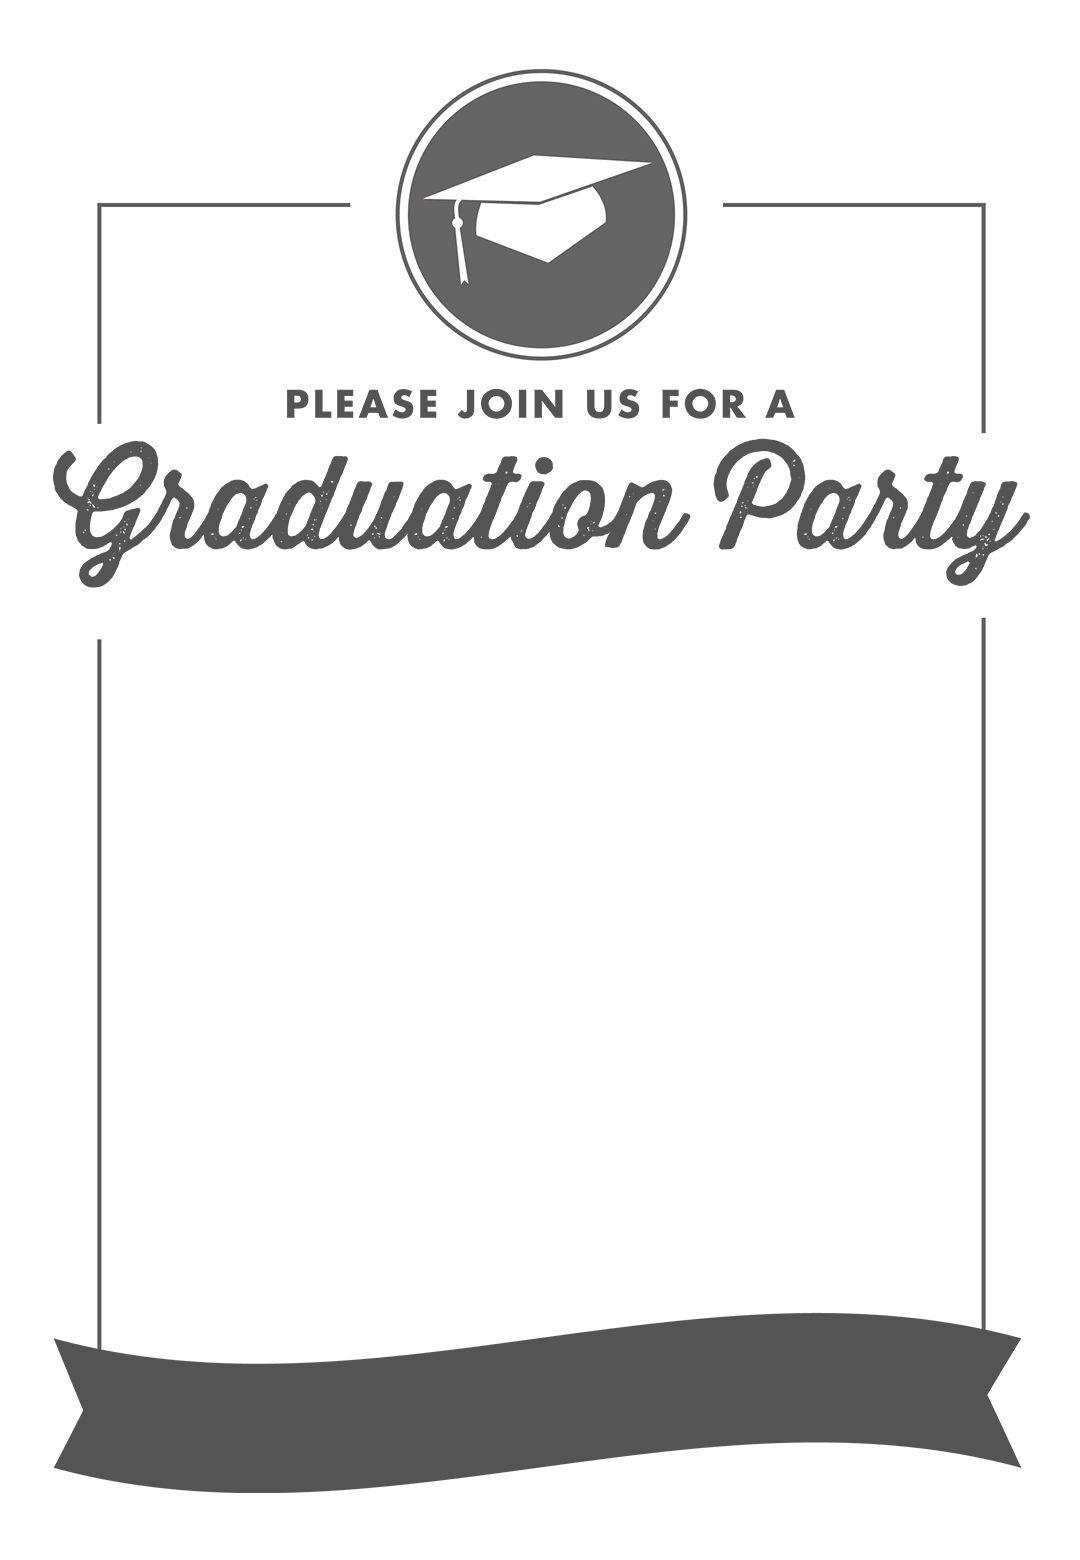 Free Printable Graduation Party Invitation Template | Greetings - Free Printable Graduation Invitations